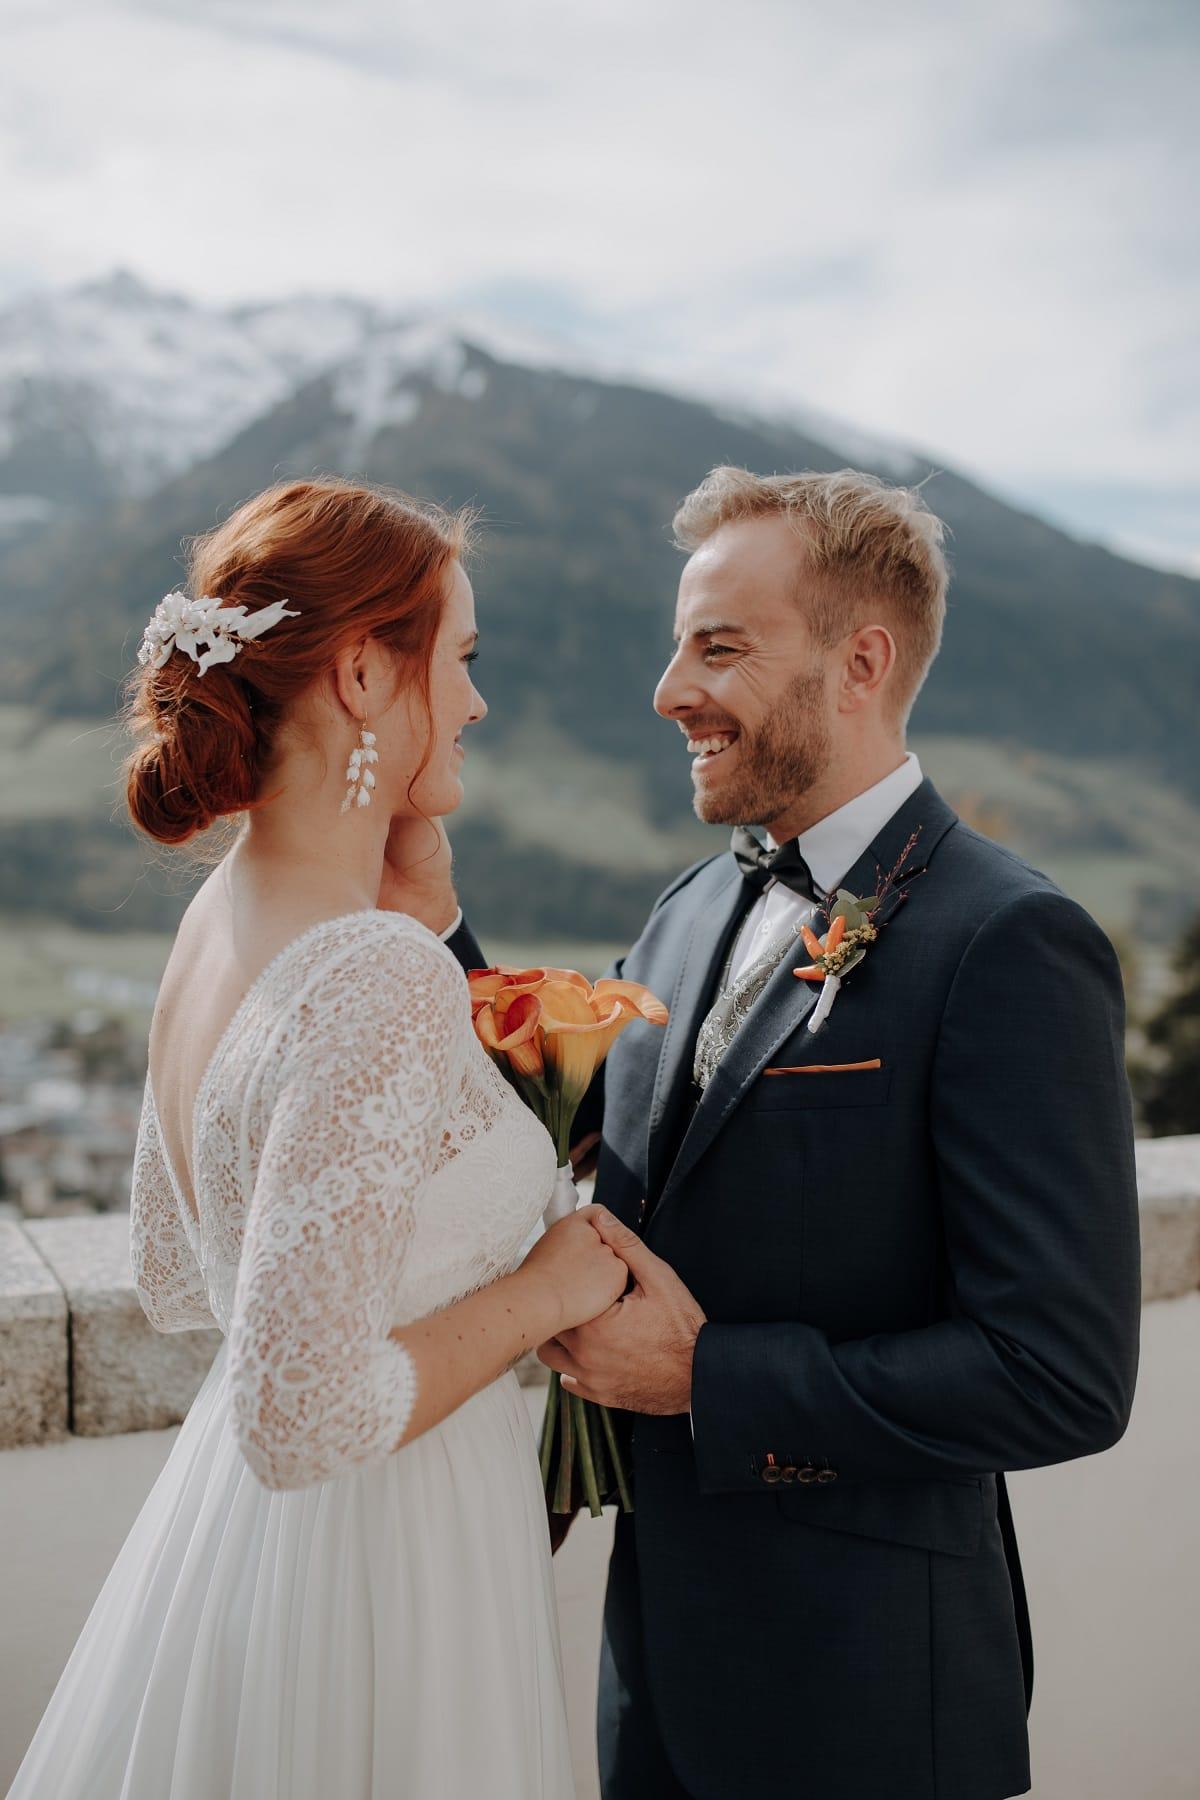 Castle Wedding in the Austrian Alps Charlotte & Oliver | Katrin Kerschbaumer Photography | Stressfree Weddings by SandraM